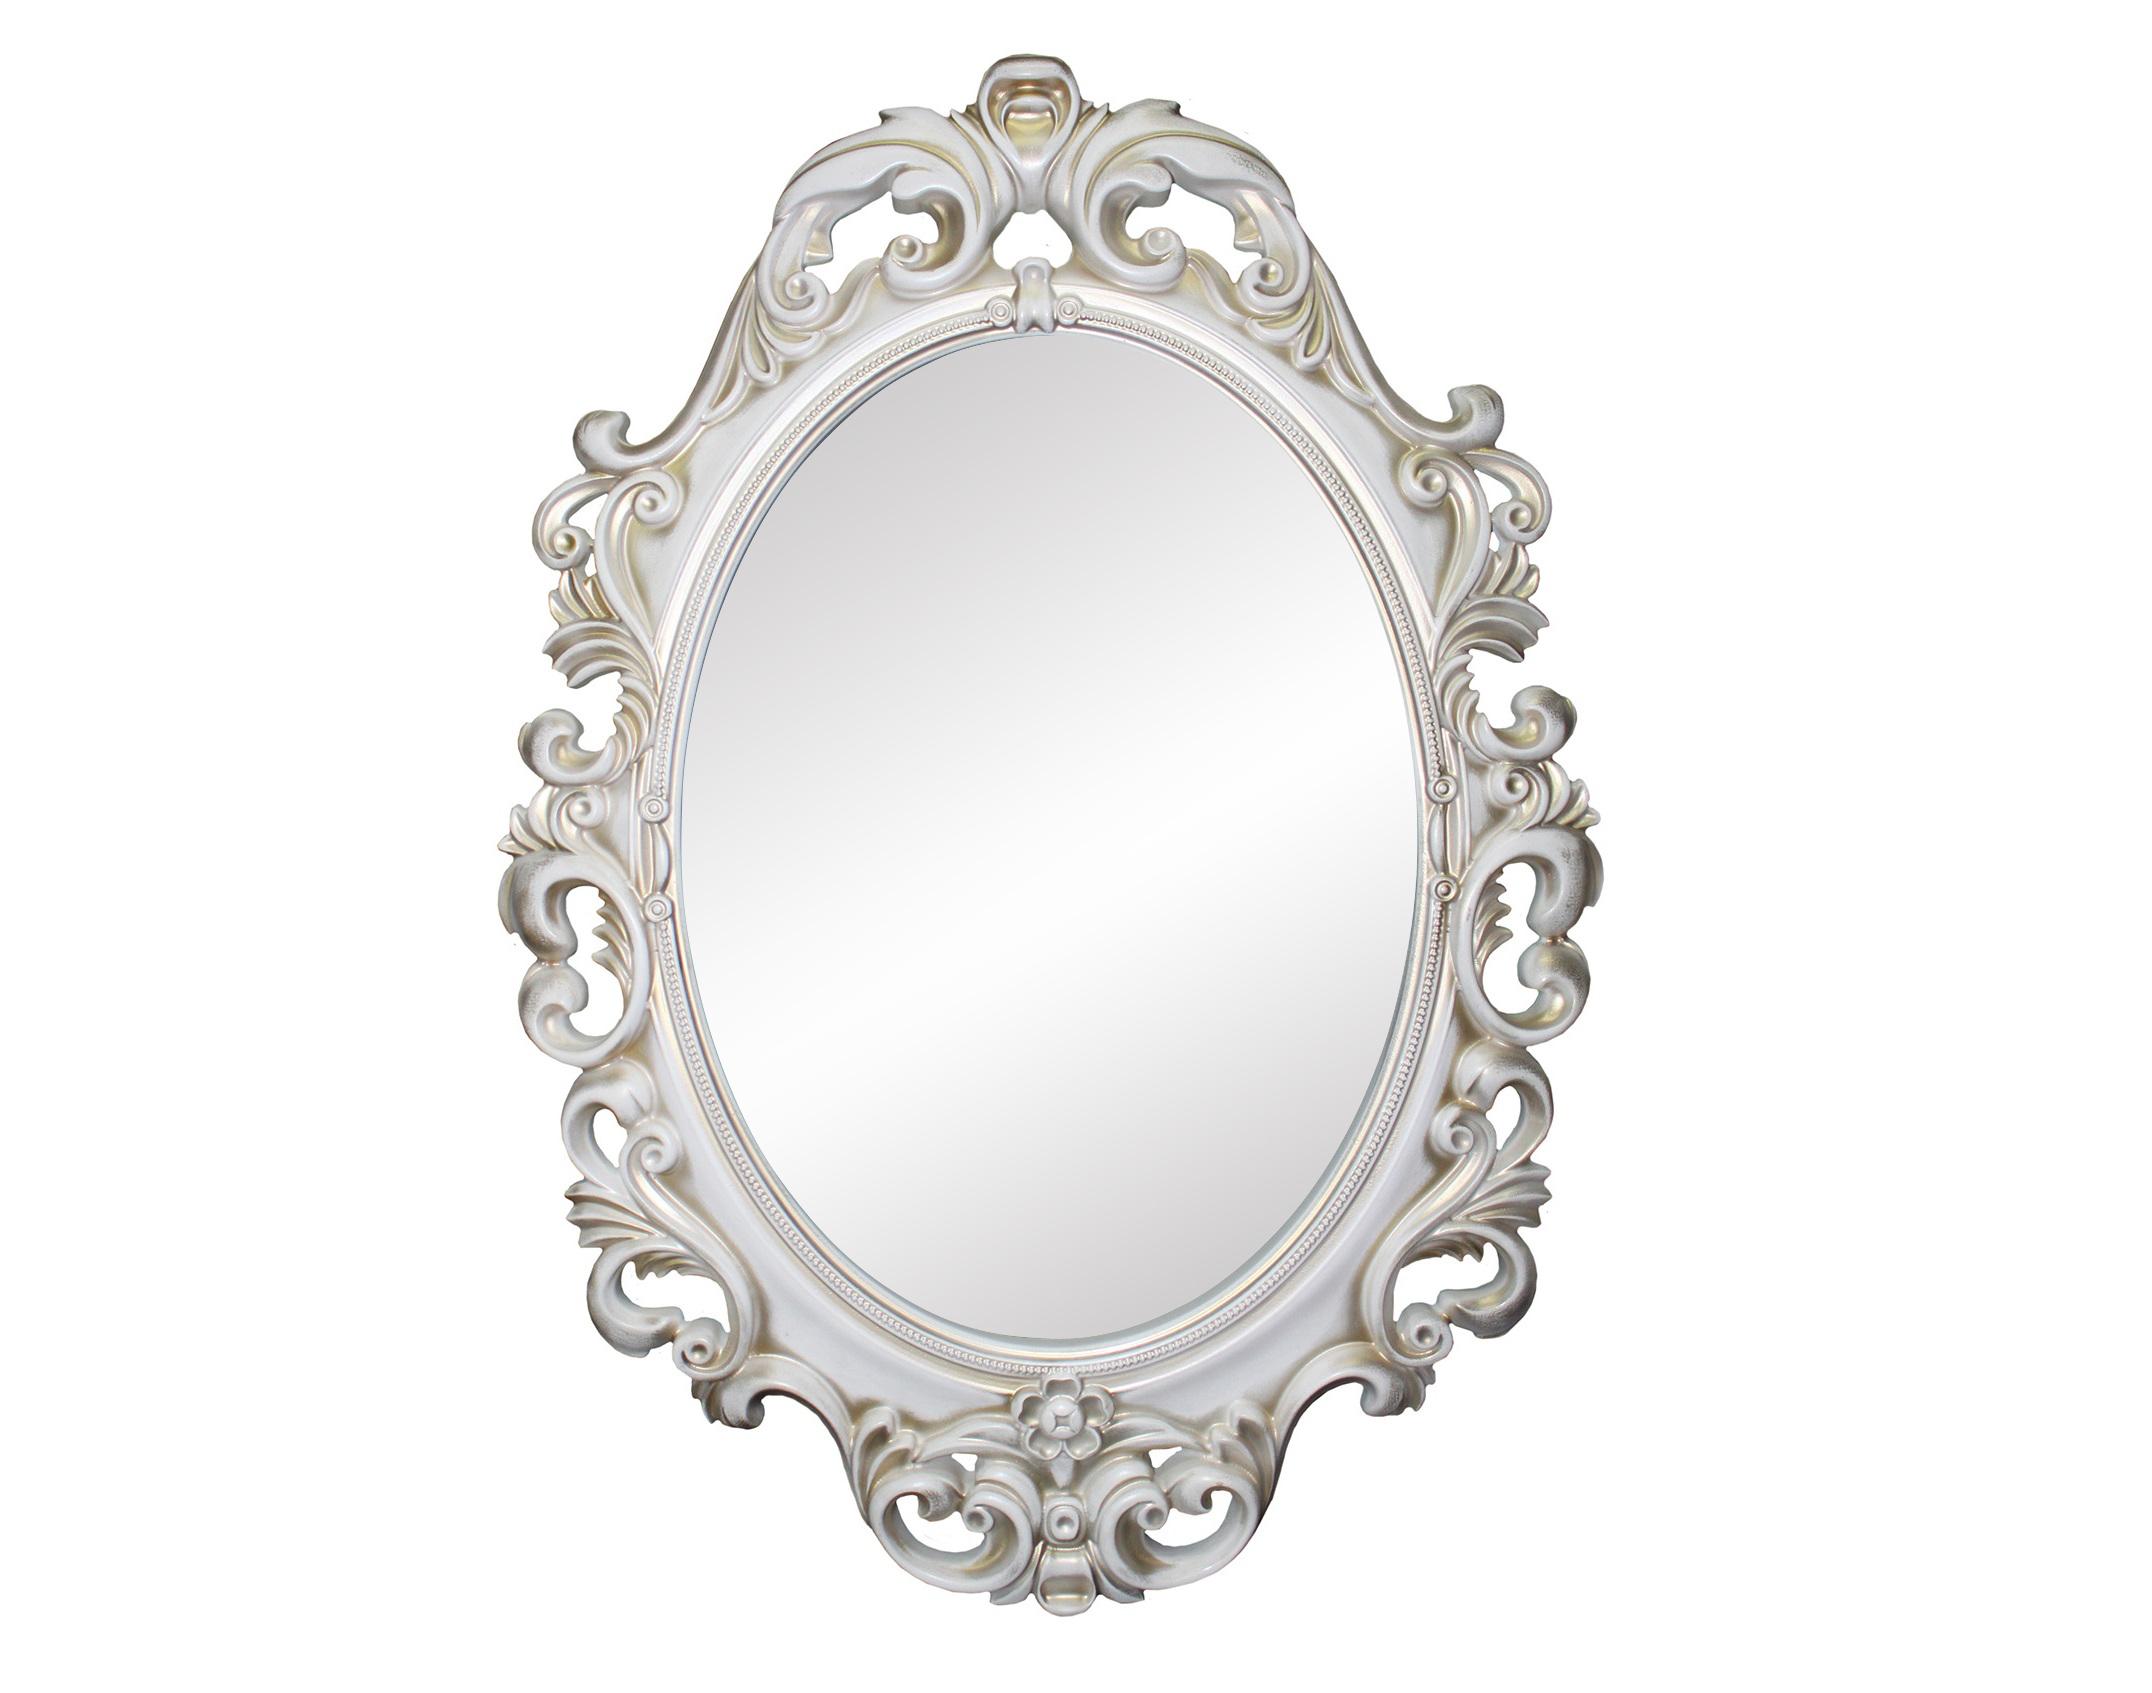 Зеркало ВинтажНастенные зеркала<br><br><br>Material: Стекло<br>Ширина см: 67<br>Высота см: 96<br>Глубина см: 4